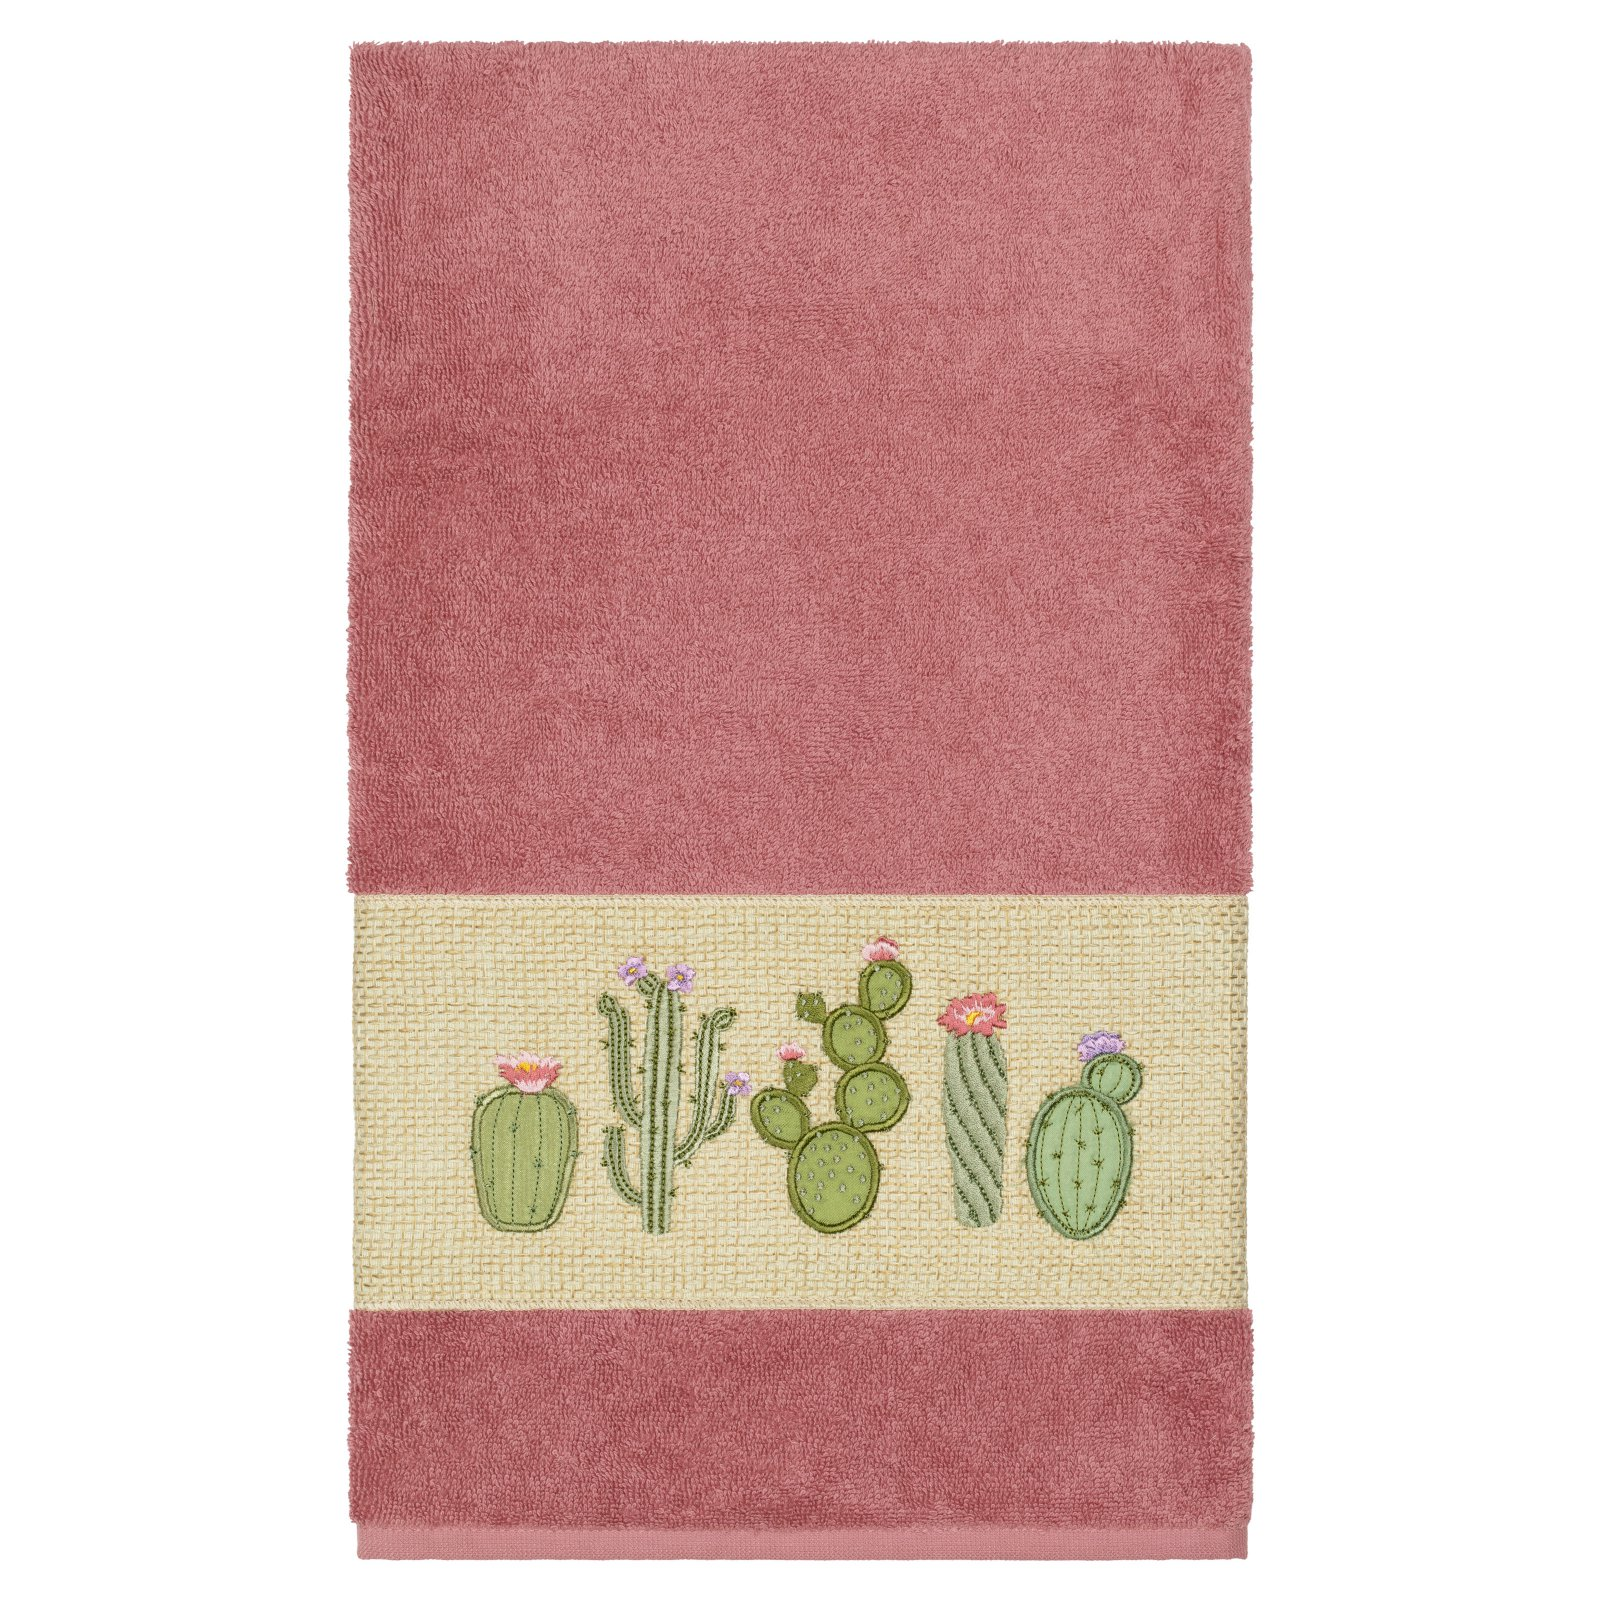 Linum Home Textiles Mila Embellished Turkish Cotton Bath Towel